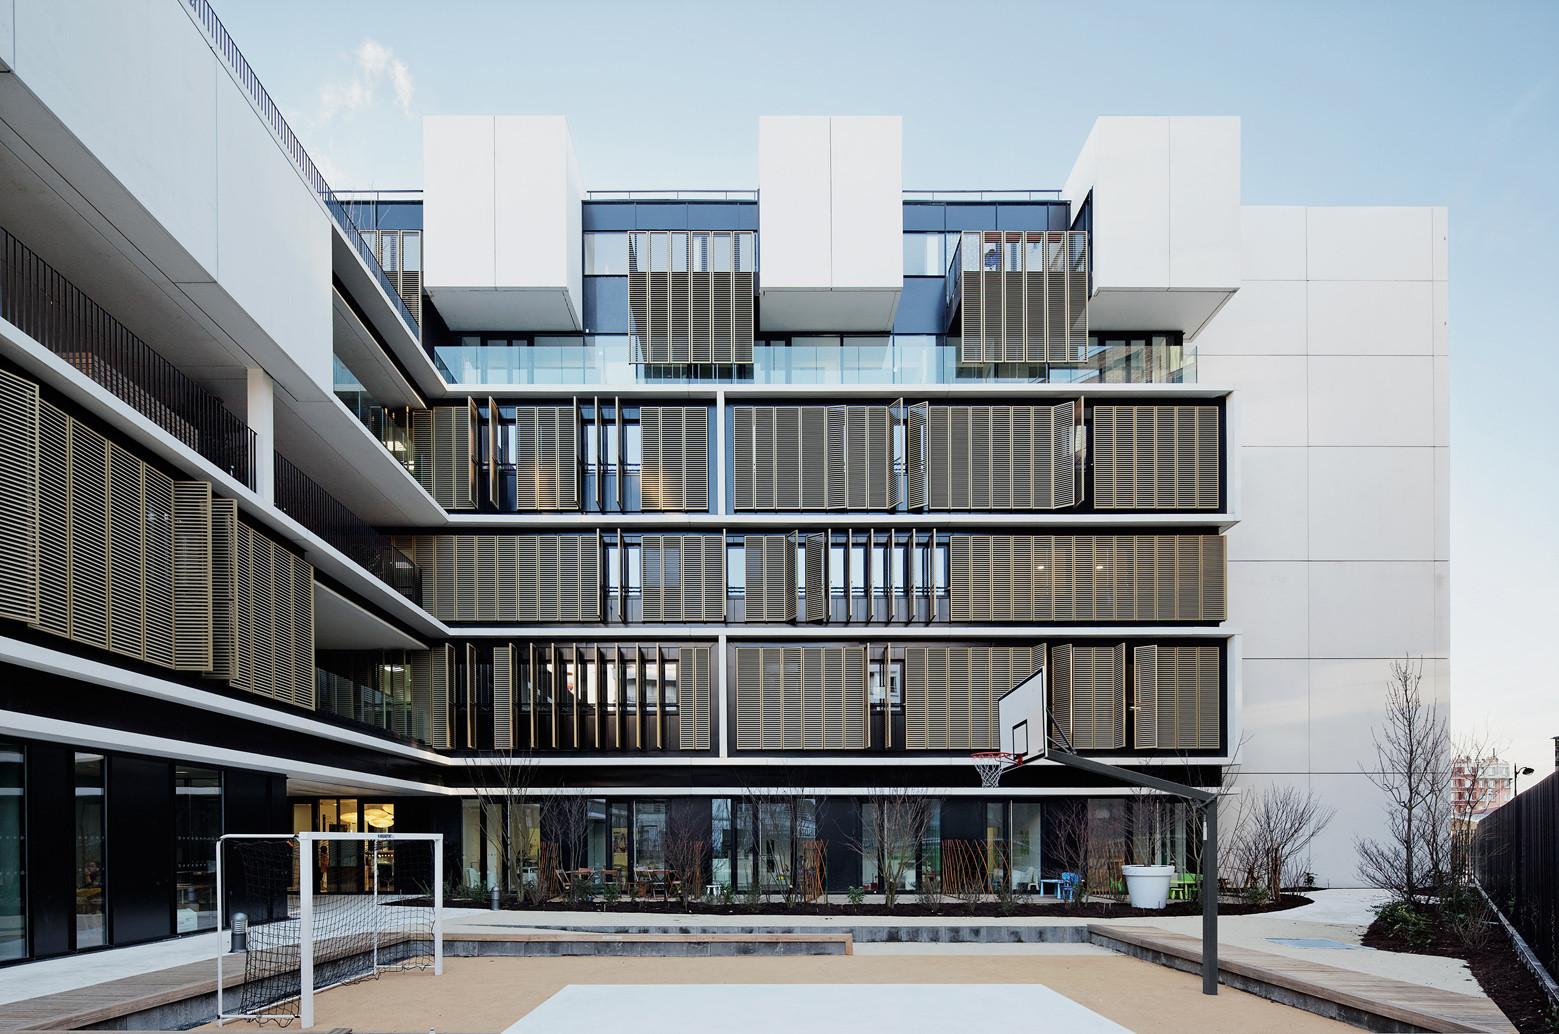 Welfare Centre for children and teenagers in Paris / Marjan Hessamfar & Joe Verons architectes associes, © Vincent Fillon